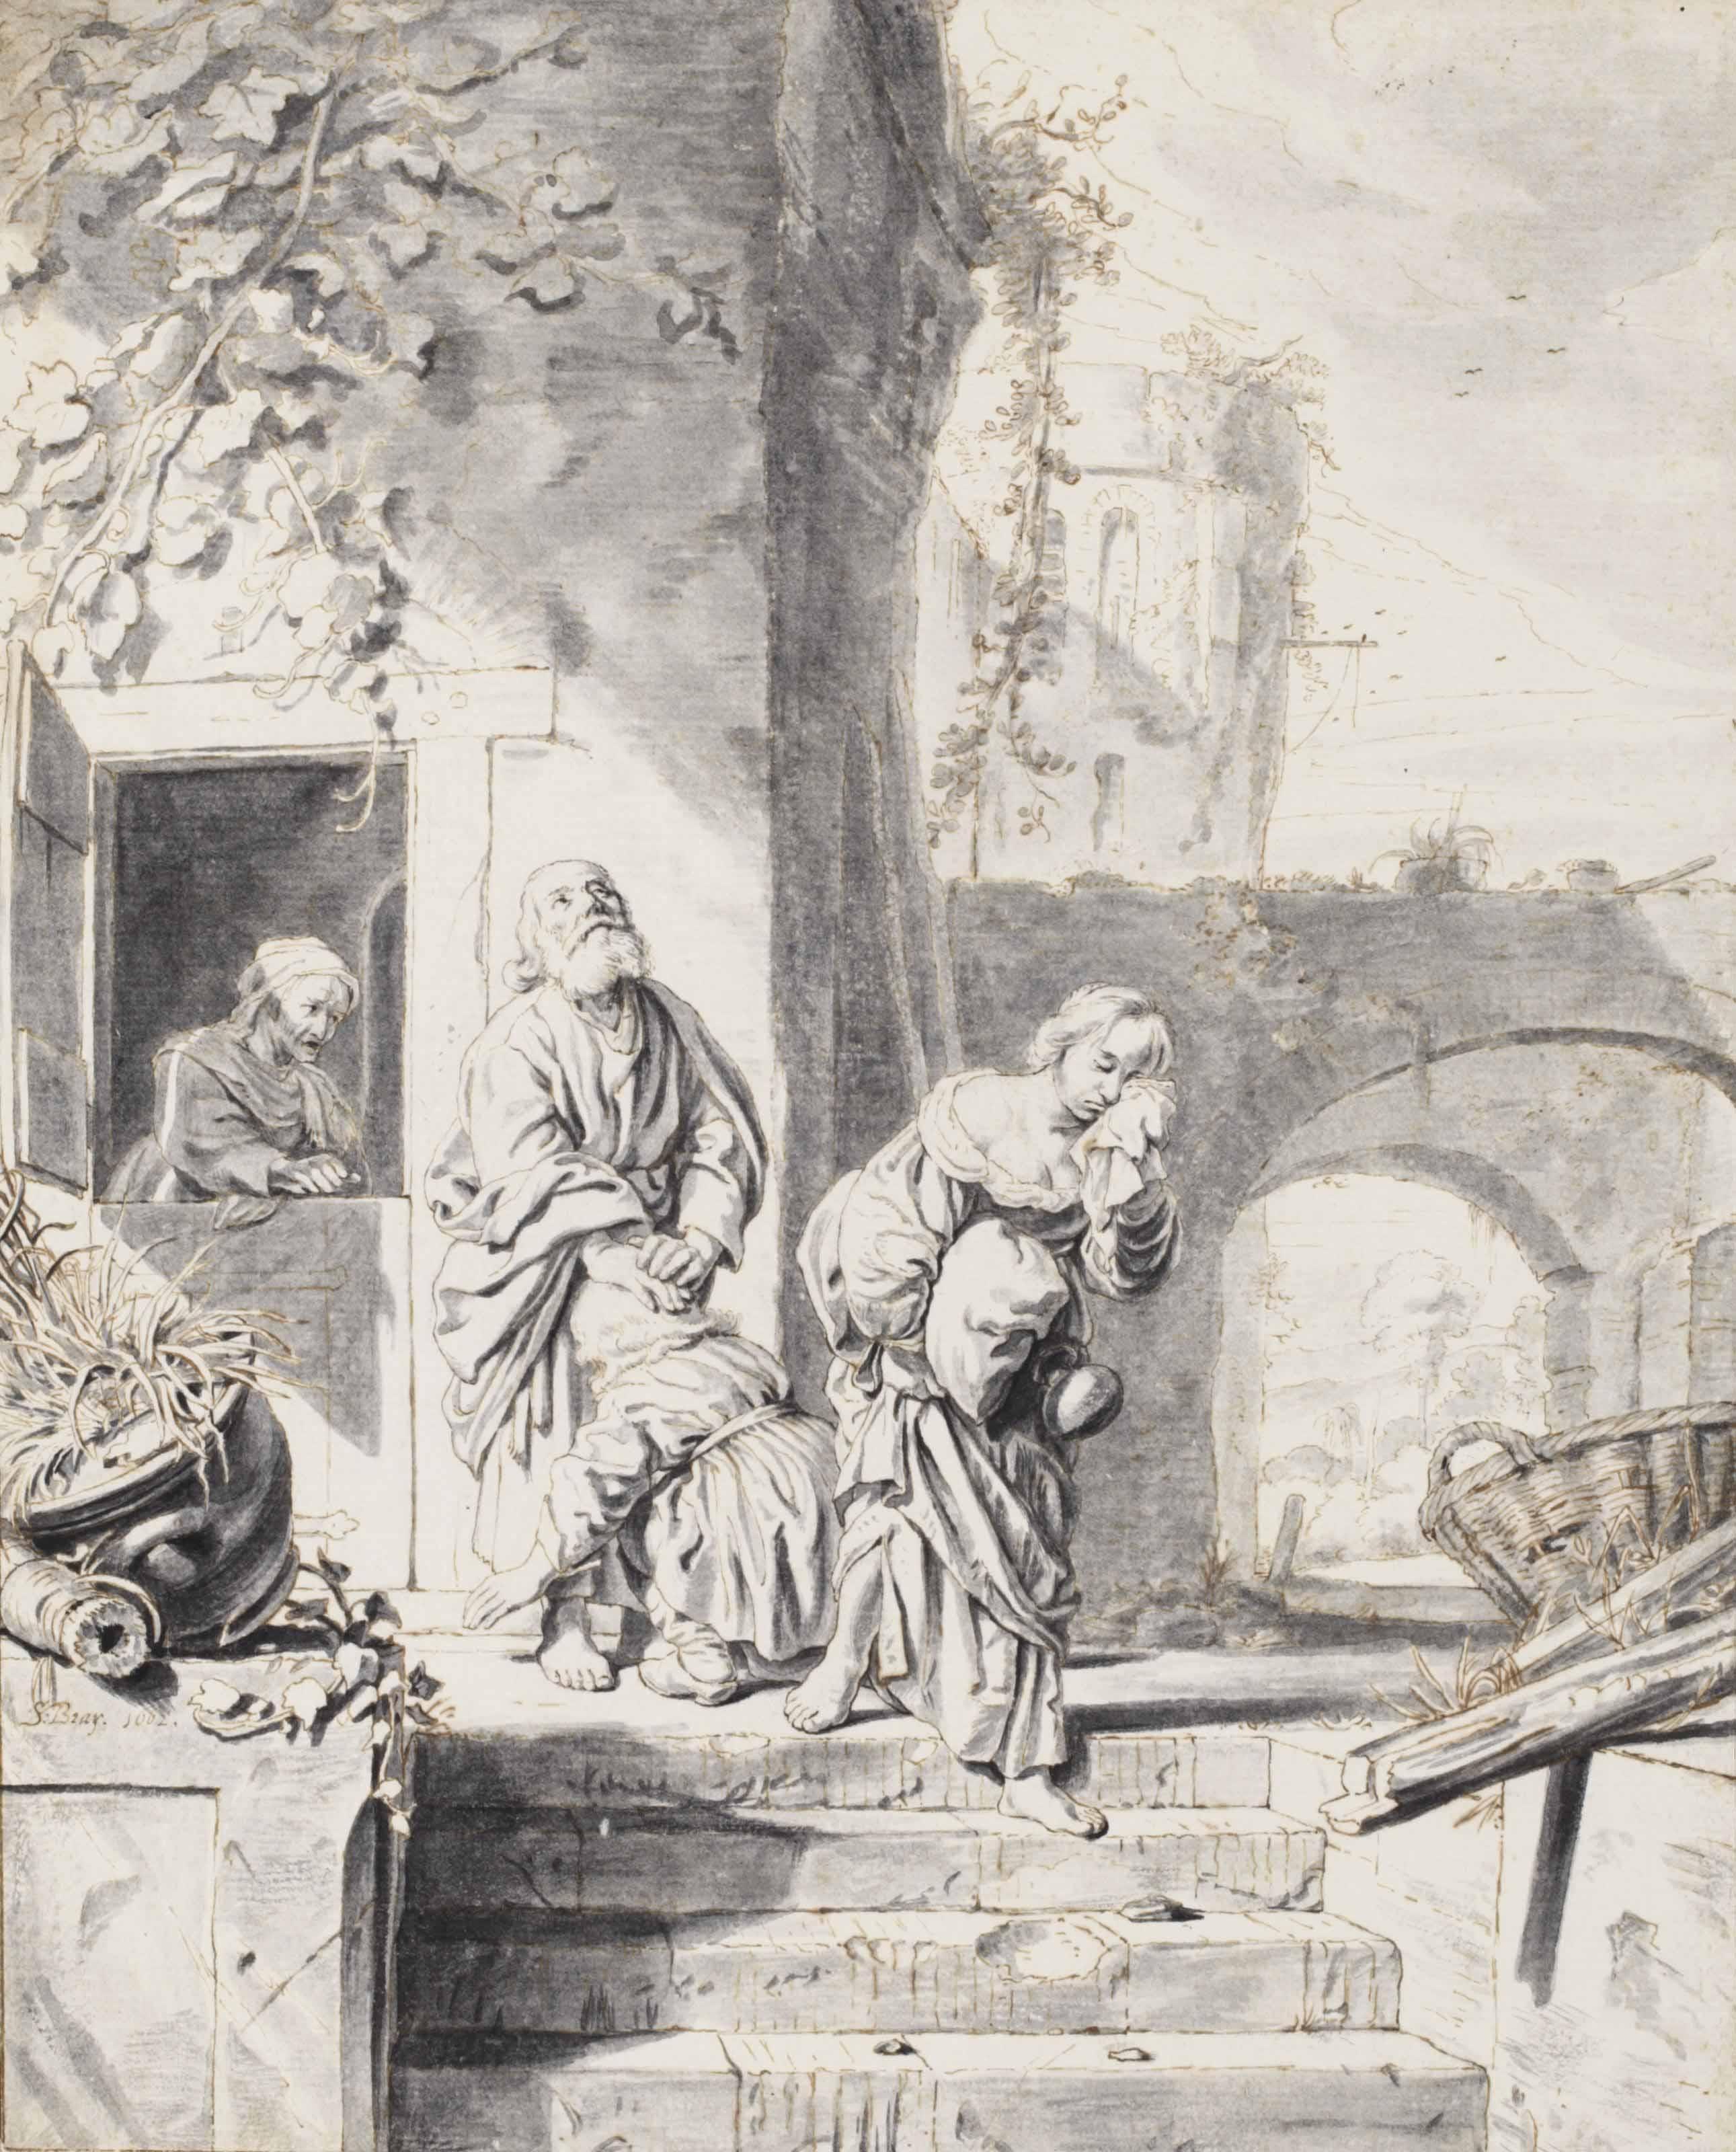 The Expulsion of Hagar and Ishmael